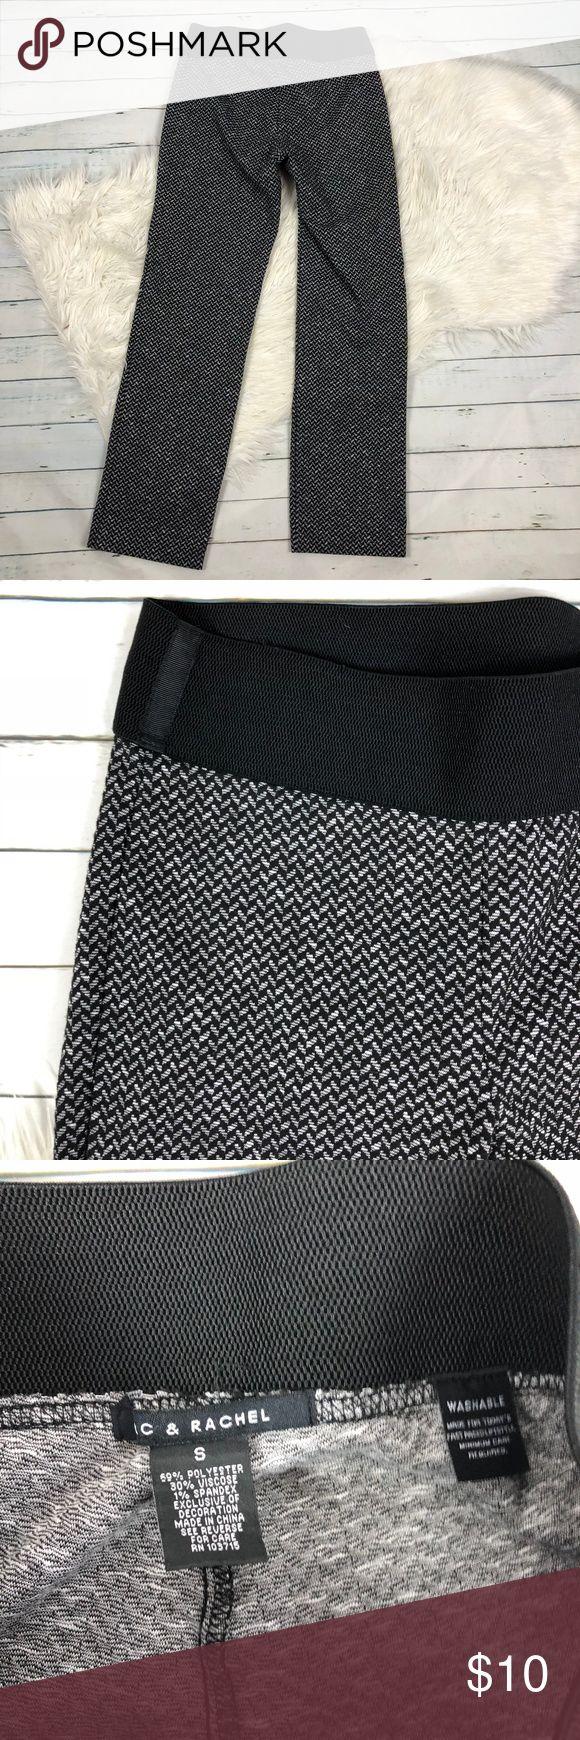 "Zac & Rachel printed soft casual pants Women's Zac & Rachel printed soft pant, polyester viscose and spandex blend. lightweight and casual  waist laying flat-14"" inseam-29""  I284 Zac & Rachel Pants Track Pants & Joggers"